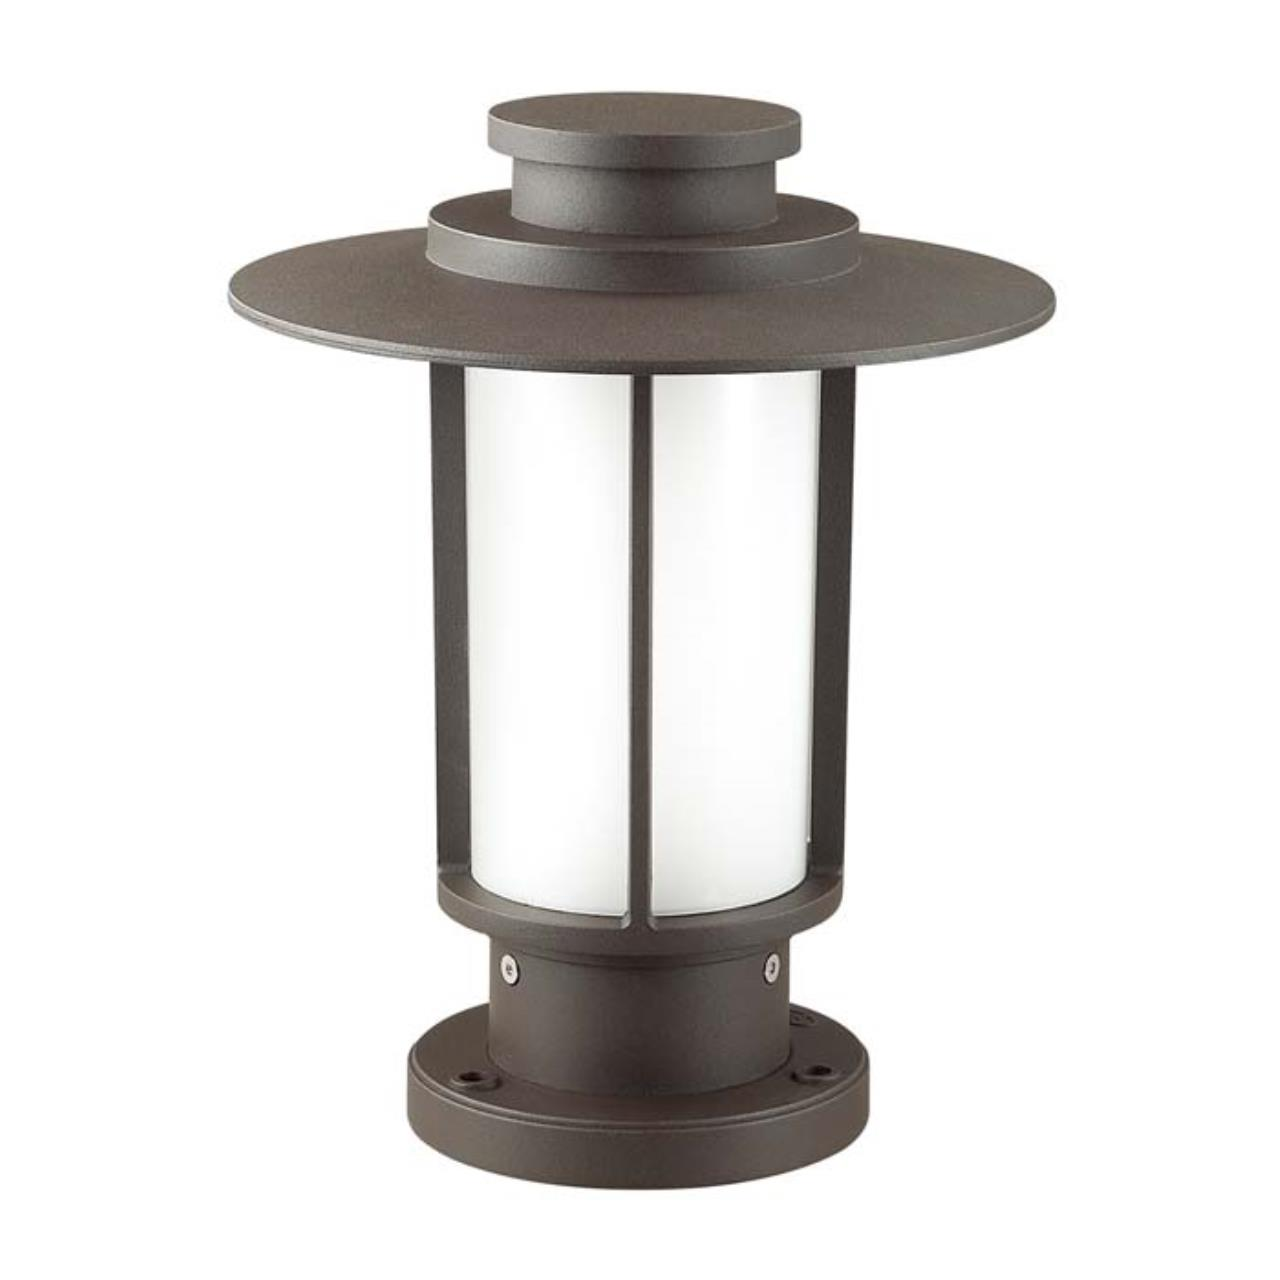 4047/1B NATURE ODL18 703 опал/темно-серый Уличный светильник на столб IP54 E27 18W 220V MITO